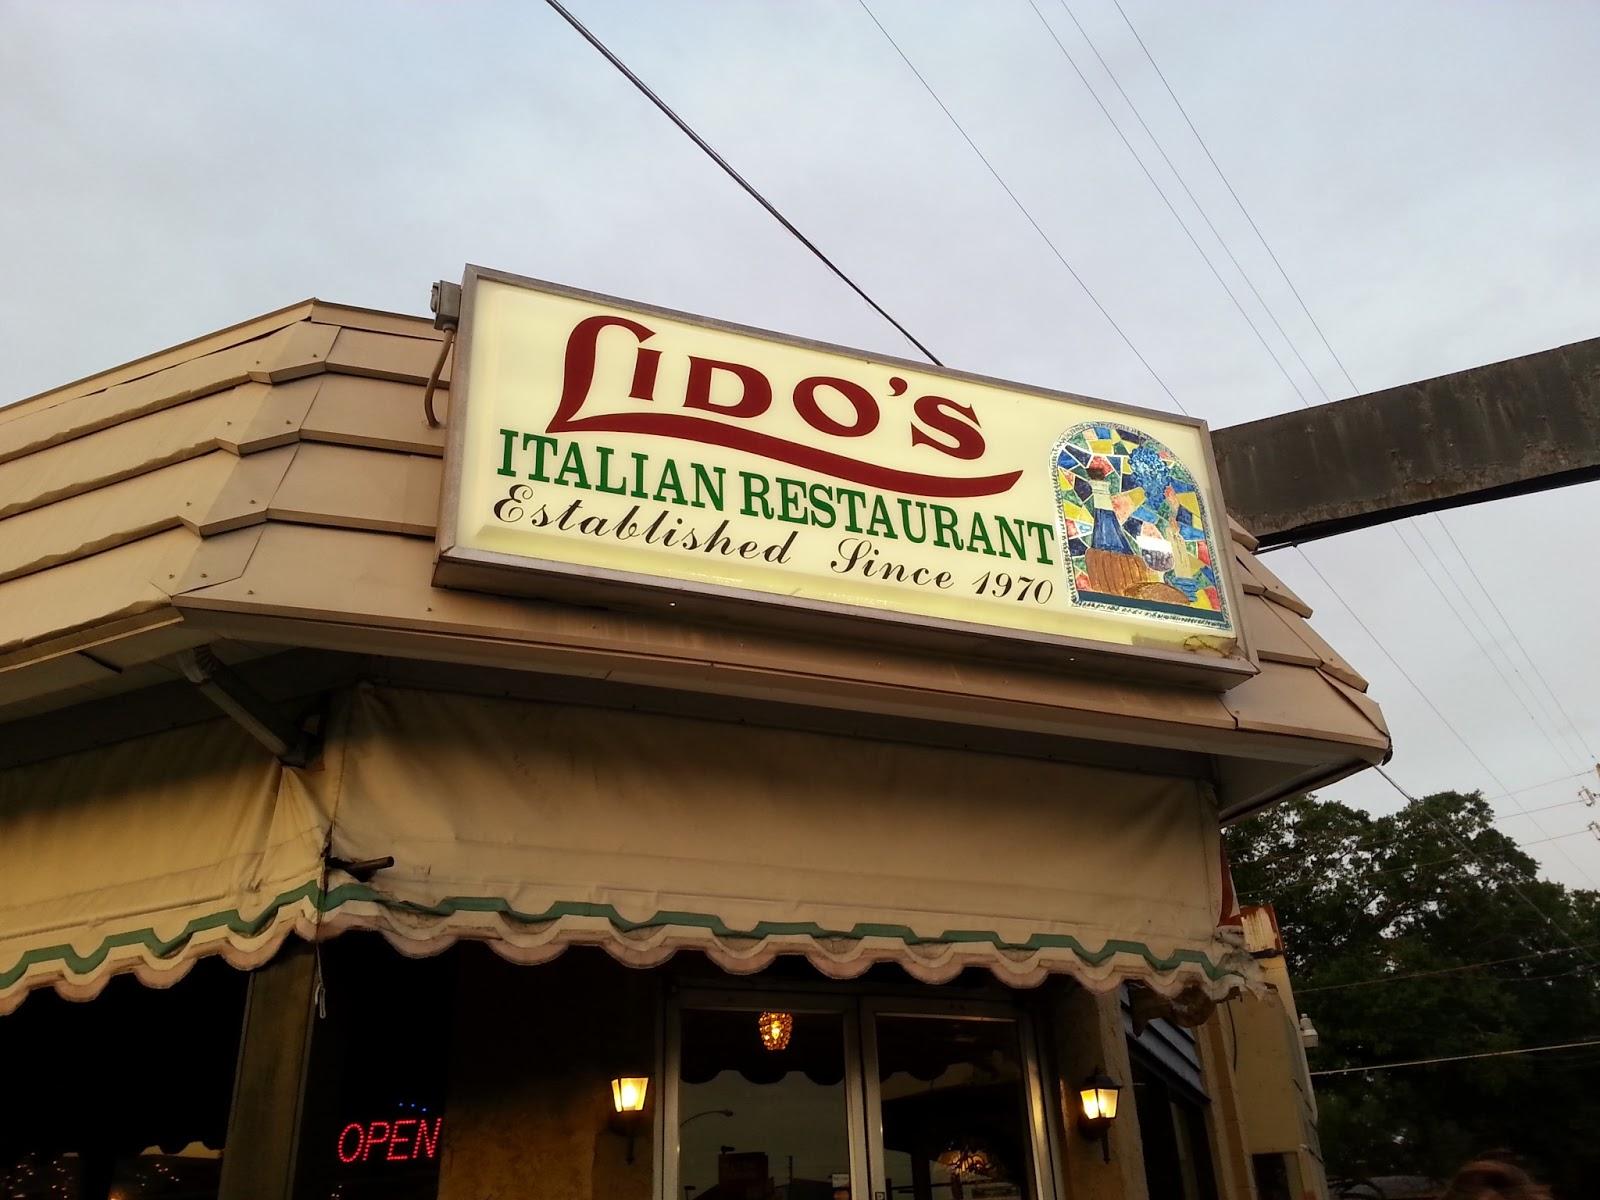 Local Girl Eats: Lido\'s Italian Restaurant - 4 Stars